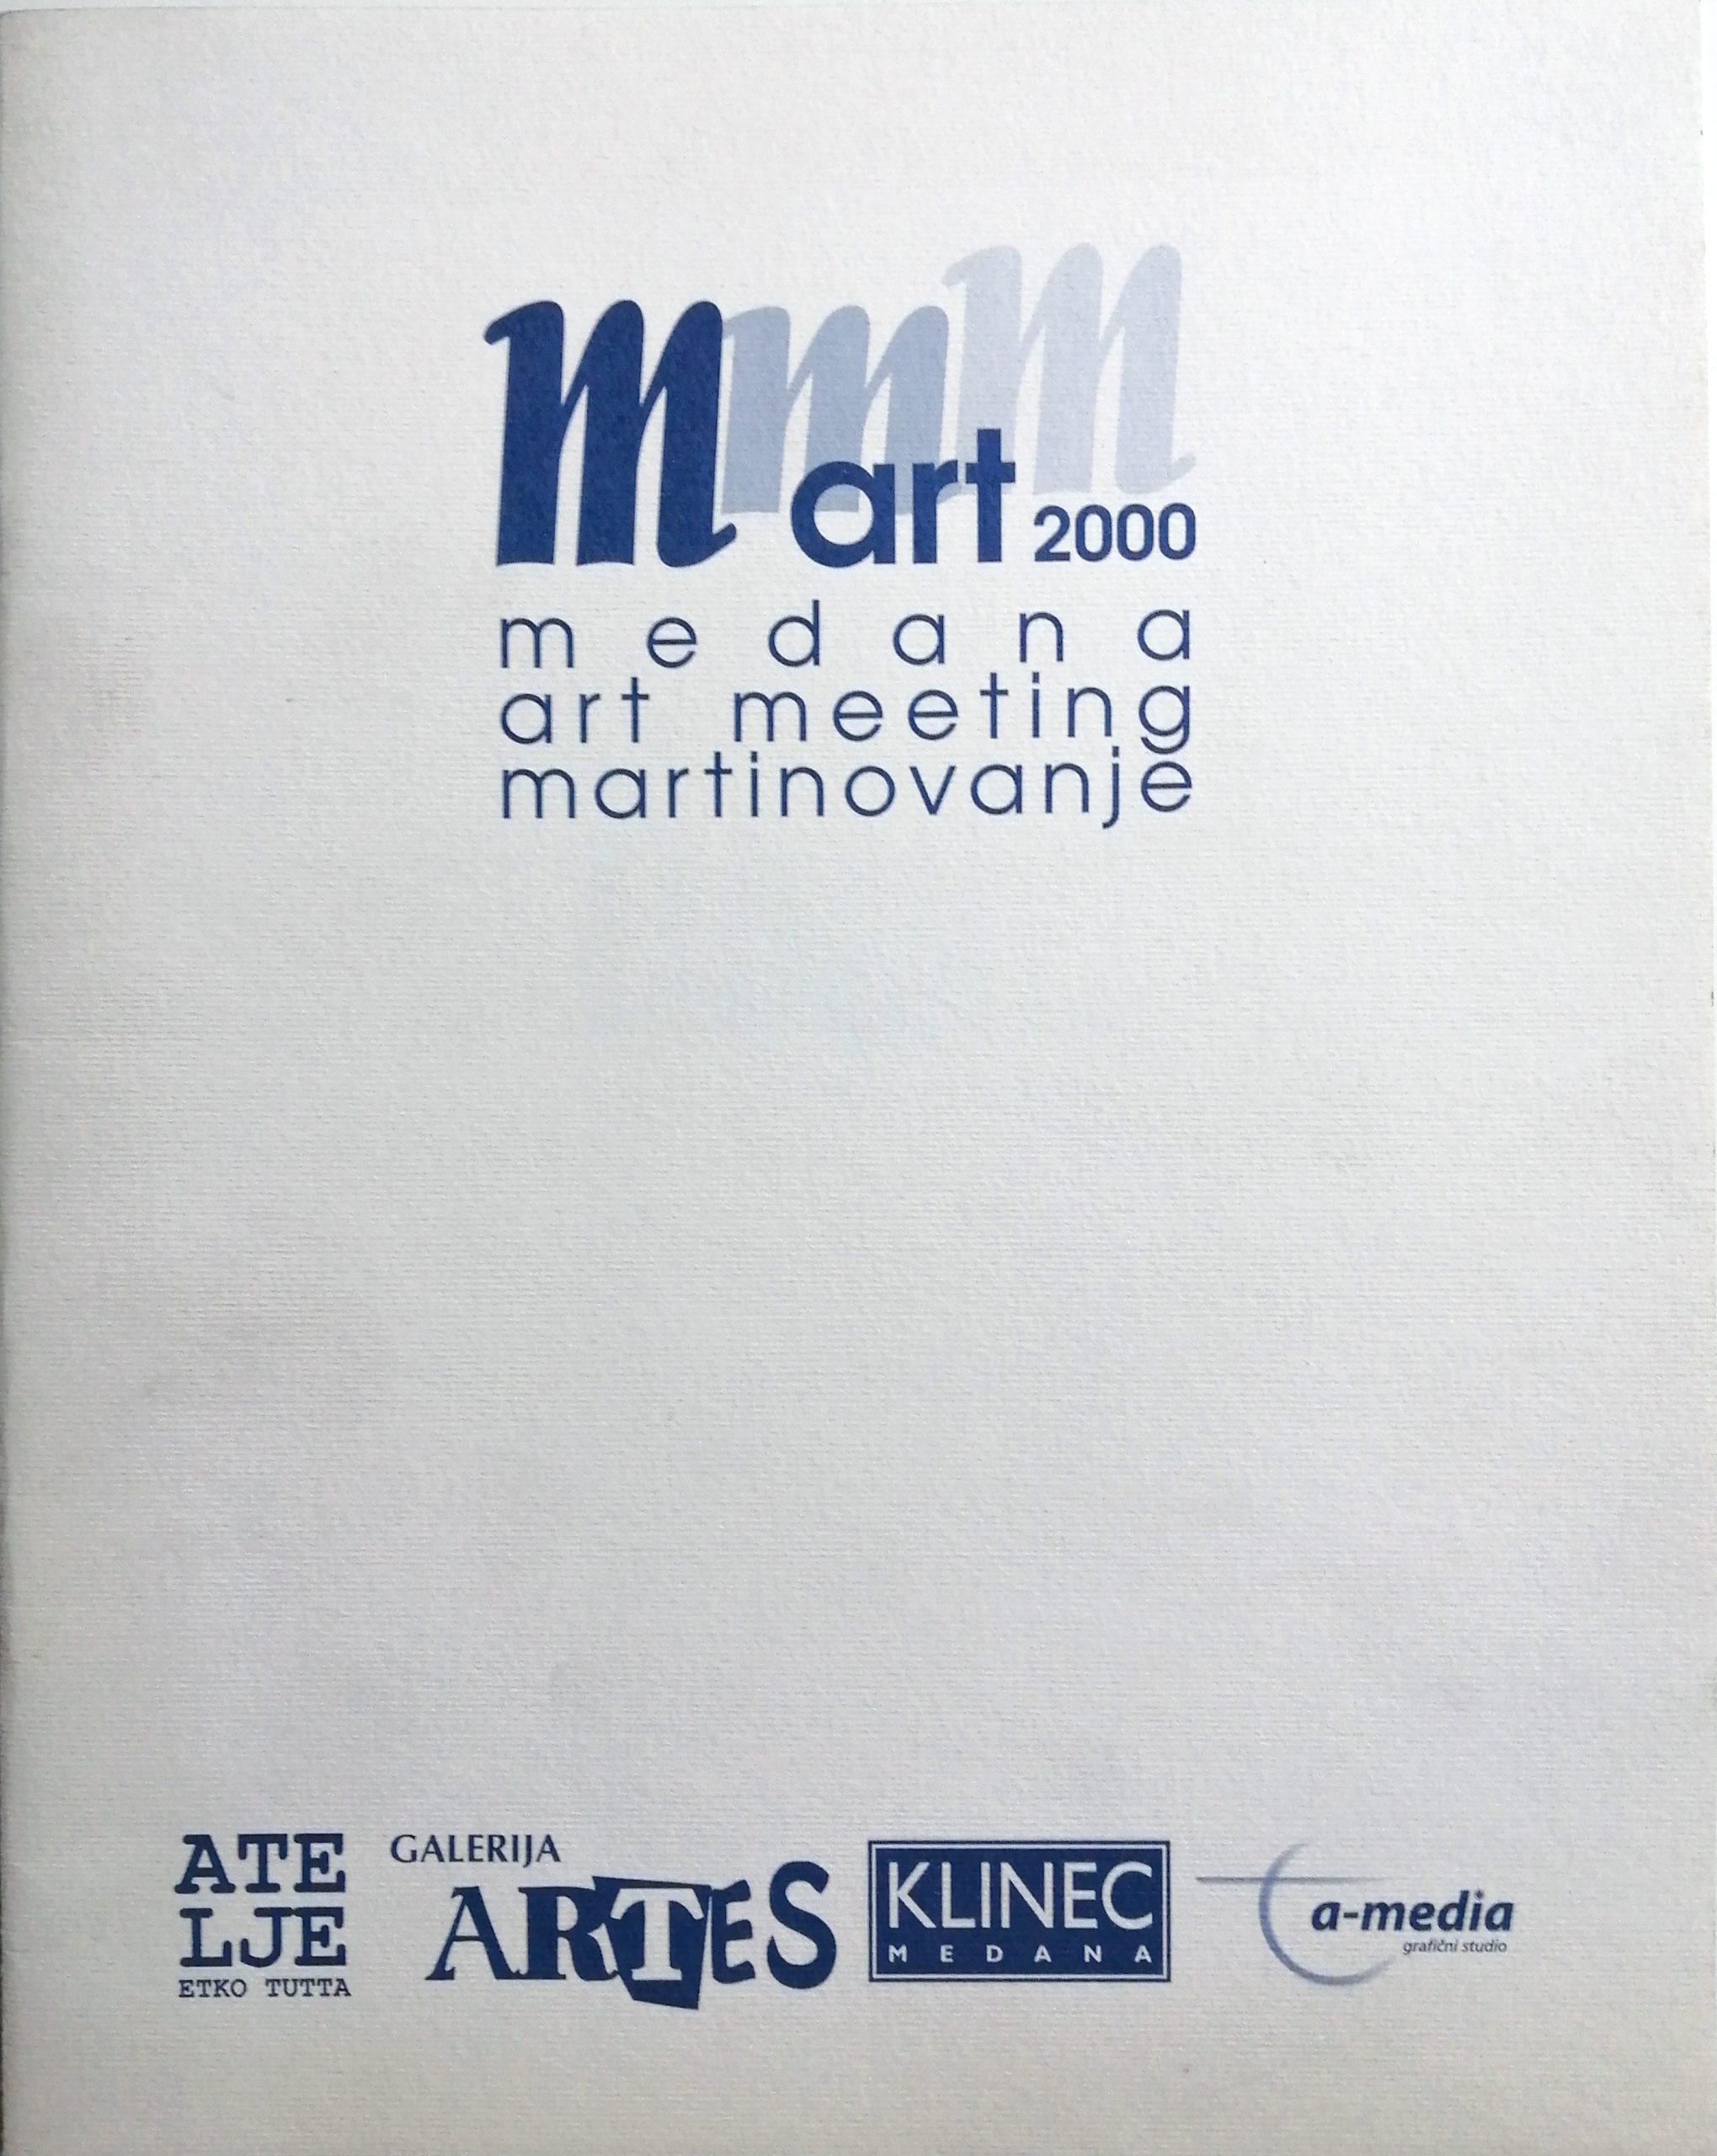 2000 MmmArt Galerija Artes Medana  scaled - Bibliography/ Catalogues